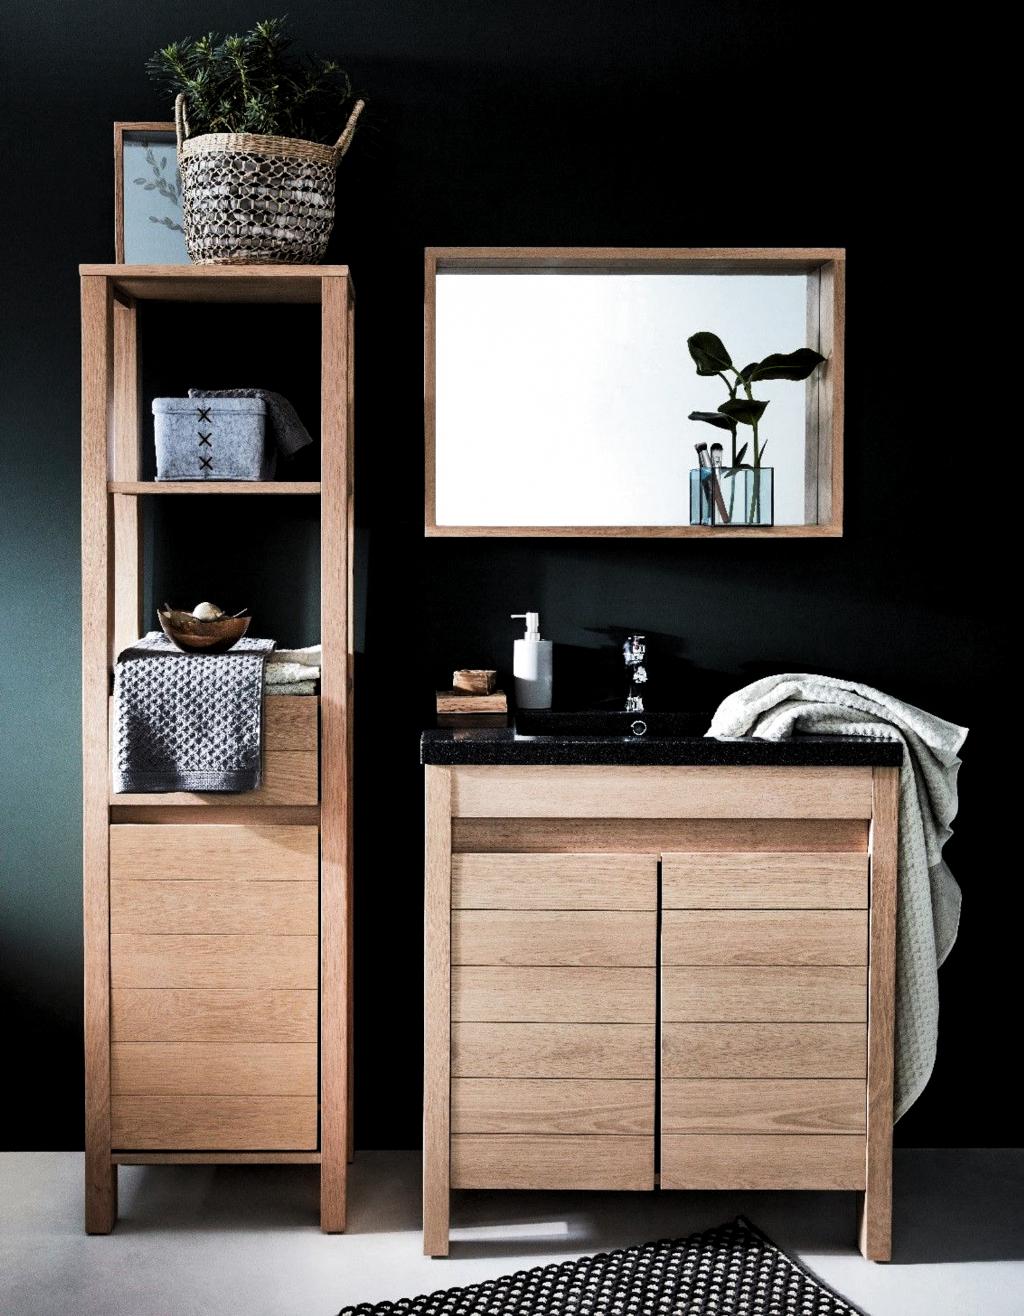 Meuble Salle Bain Bois Design Ikea Lapeyre Cote Maison In 2020 Bathroom Furniture Design Wooden Bathroom Cabinets Minimalist Bathroom Furniture